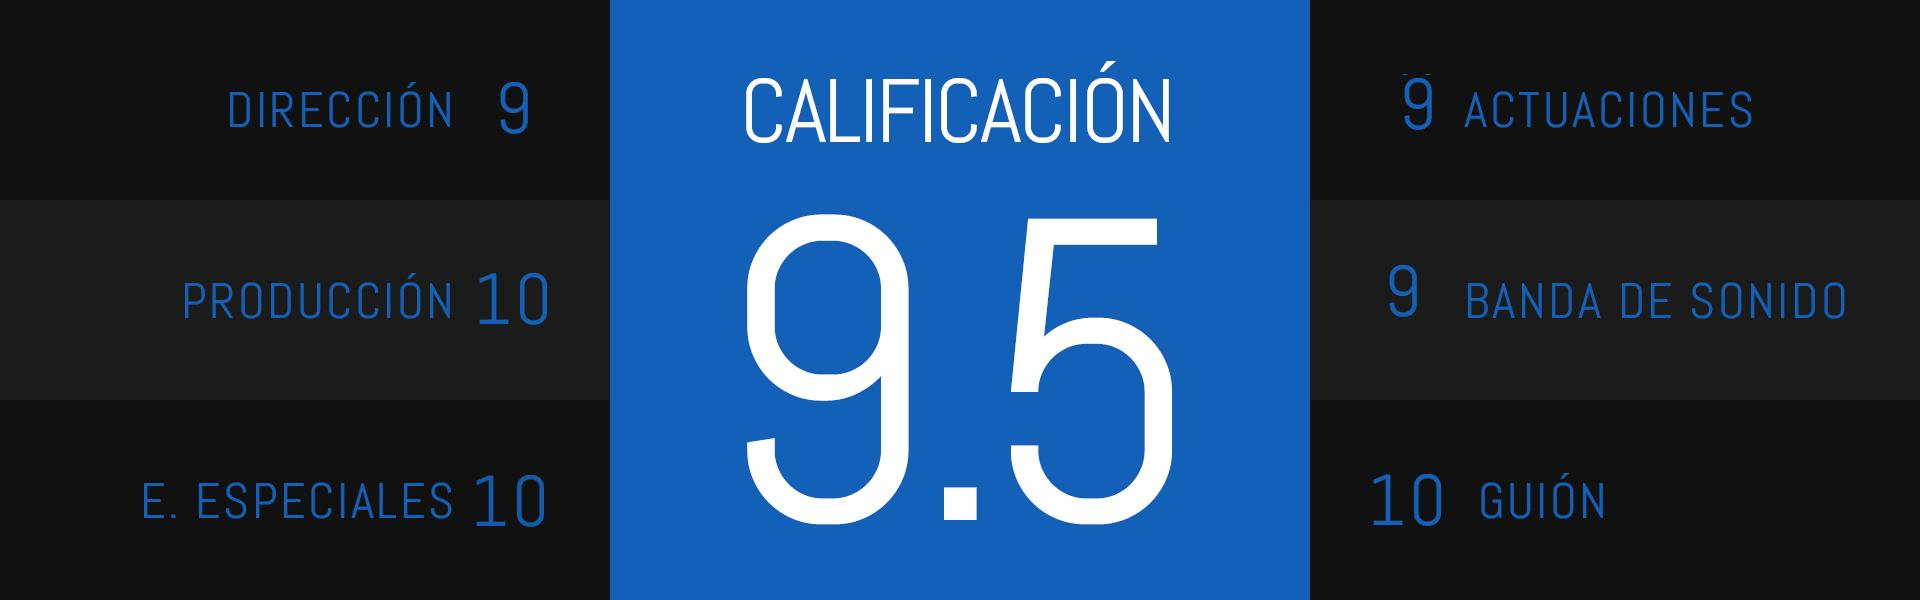 arrival-puntaje-lallegada-critica-review-pelicula-101220176